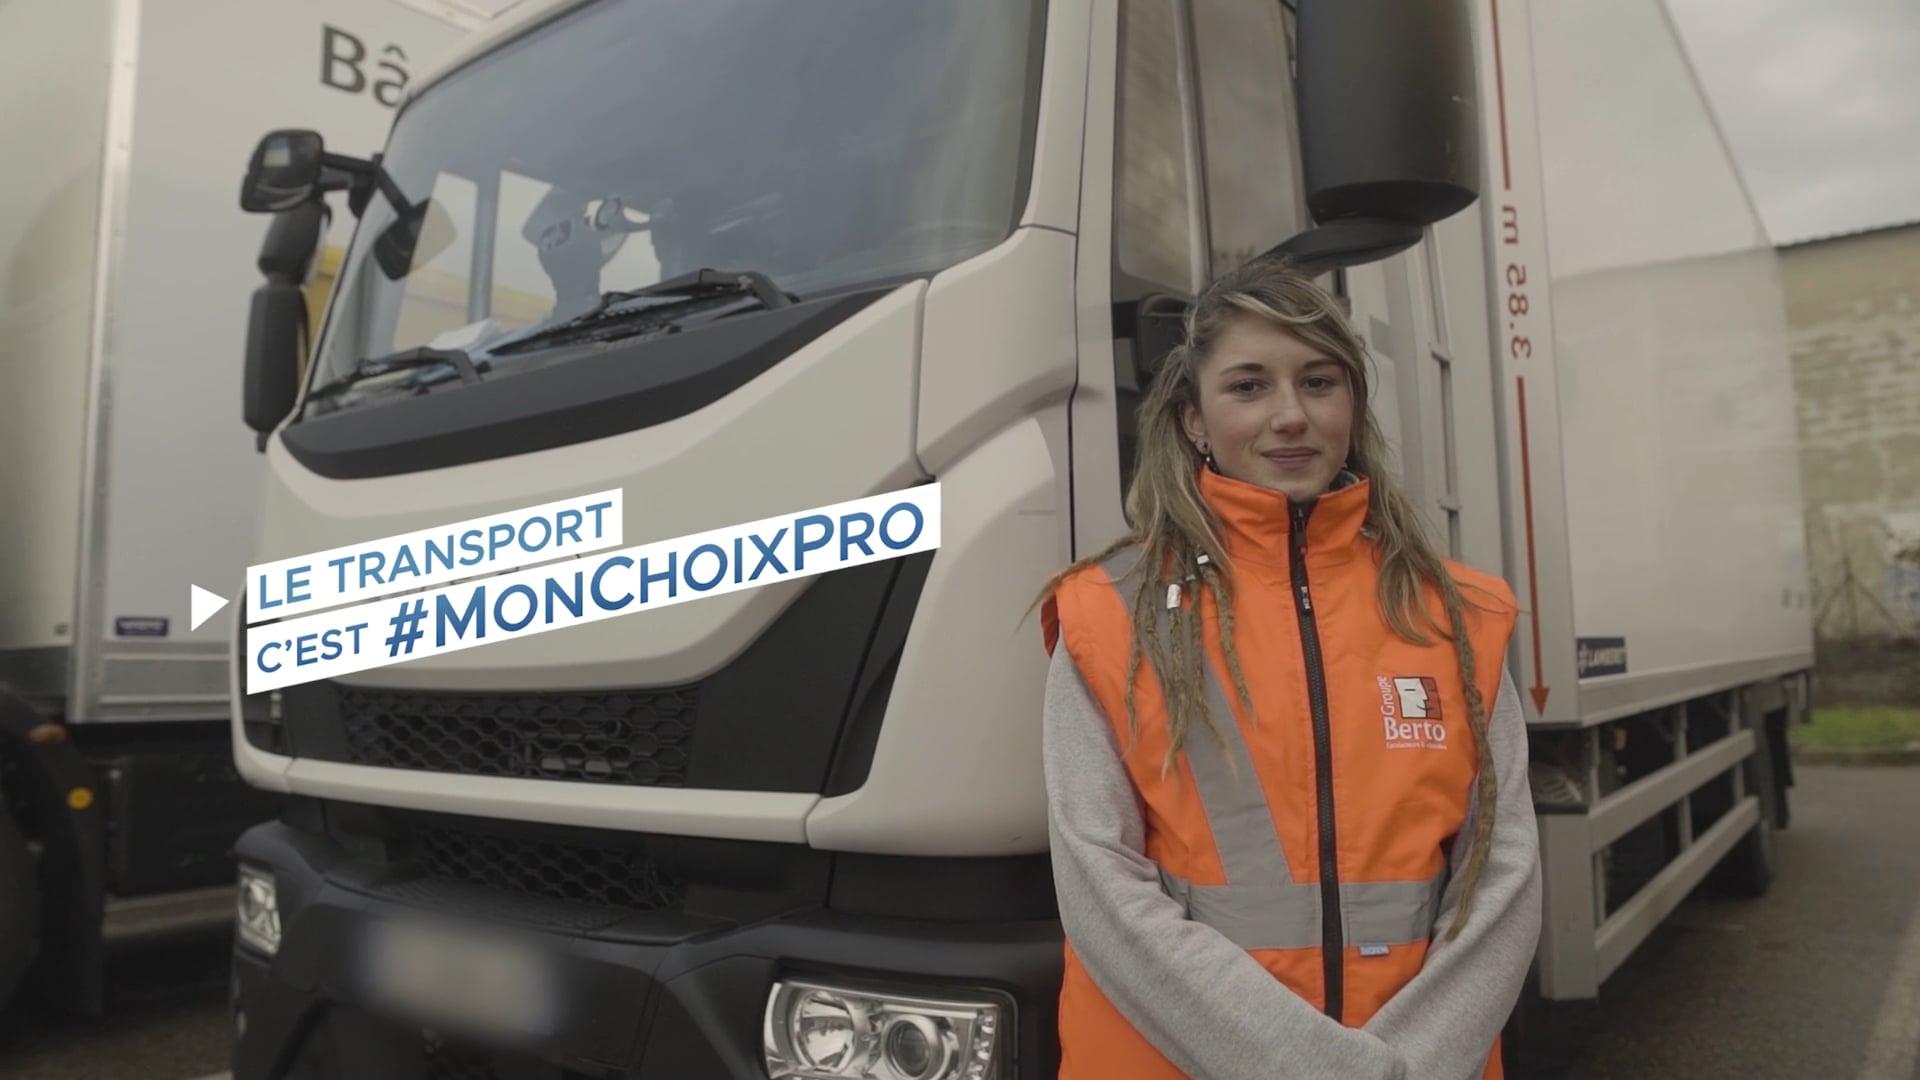 #MonChoixPro | Transport